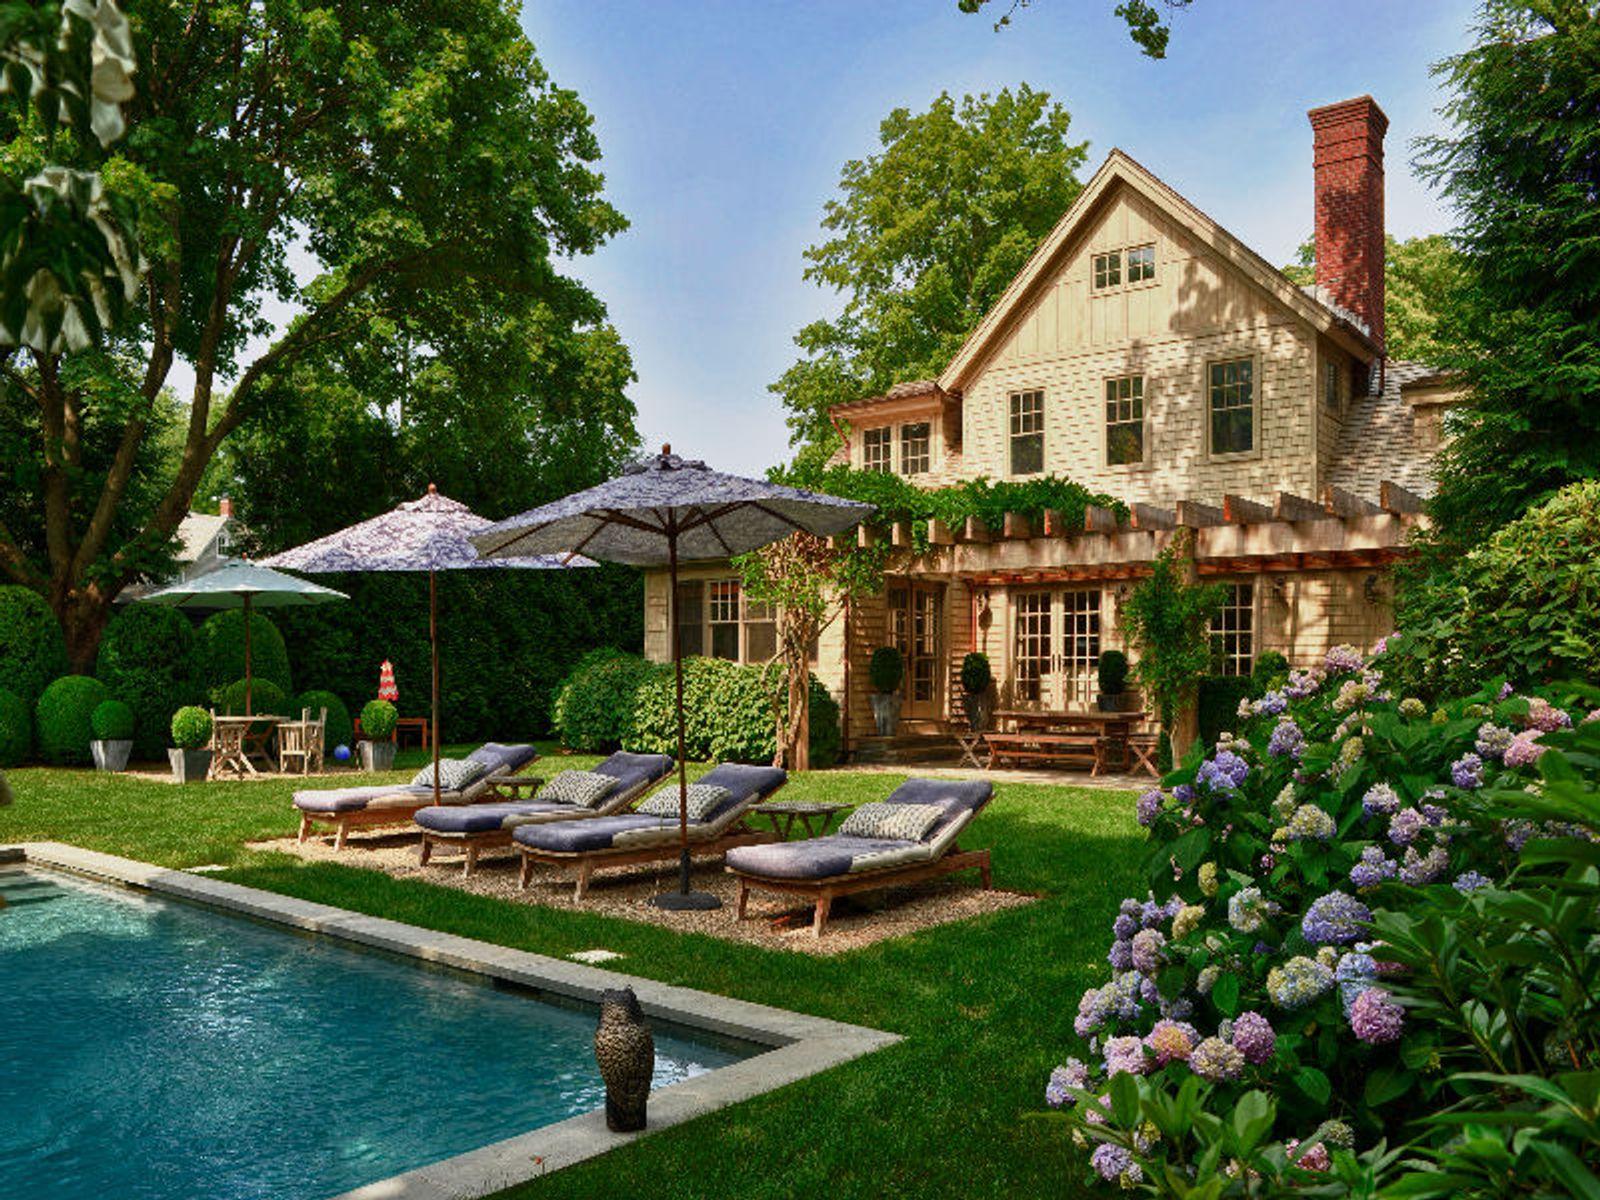 Sag harbor village jewel sag harbor ny single family for Luxury hamptons real estate